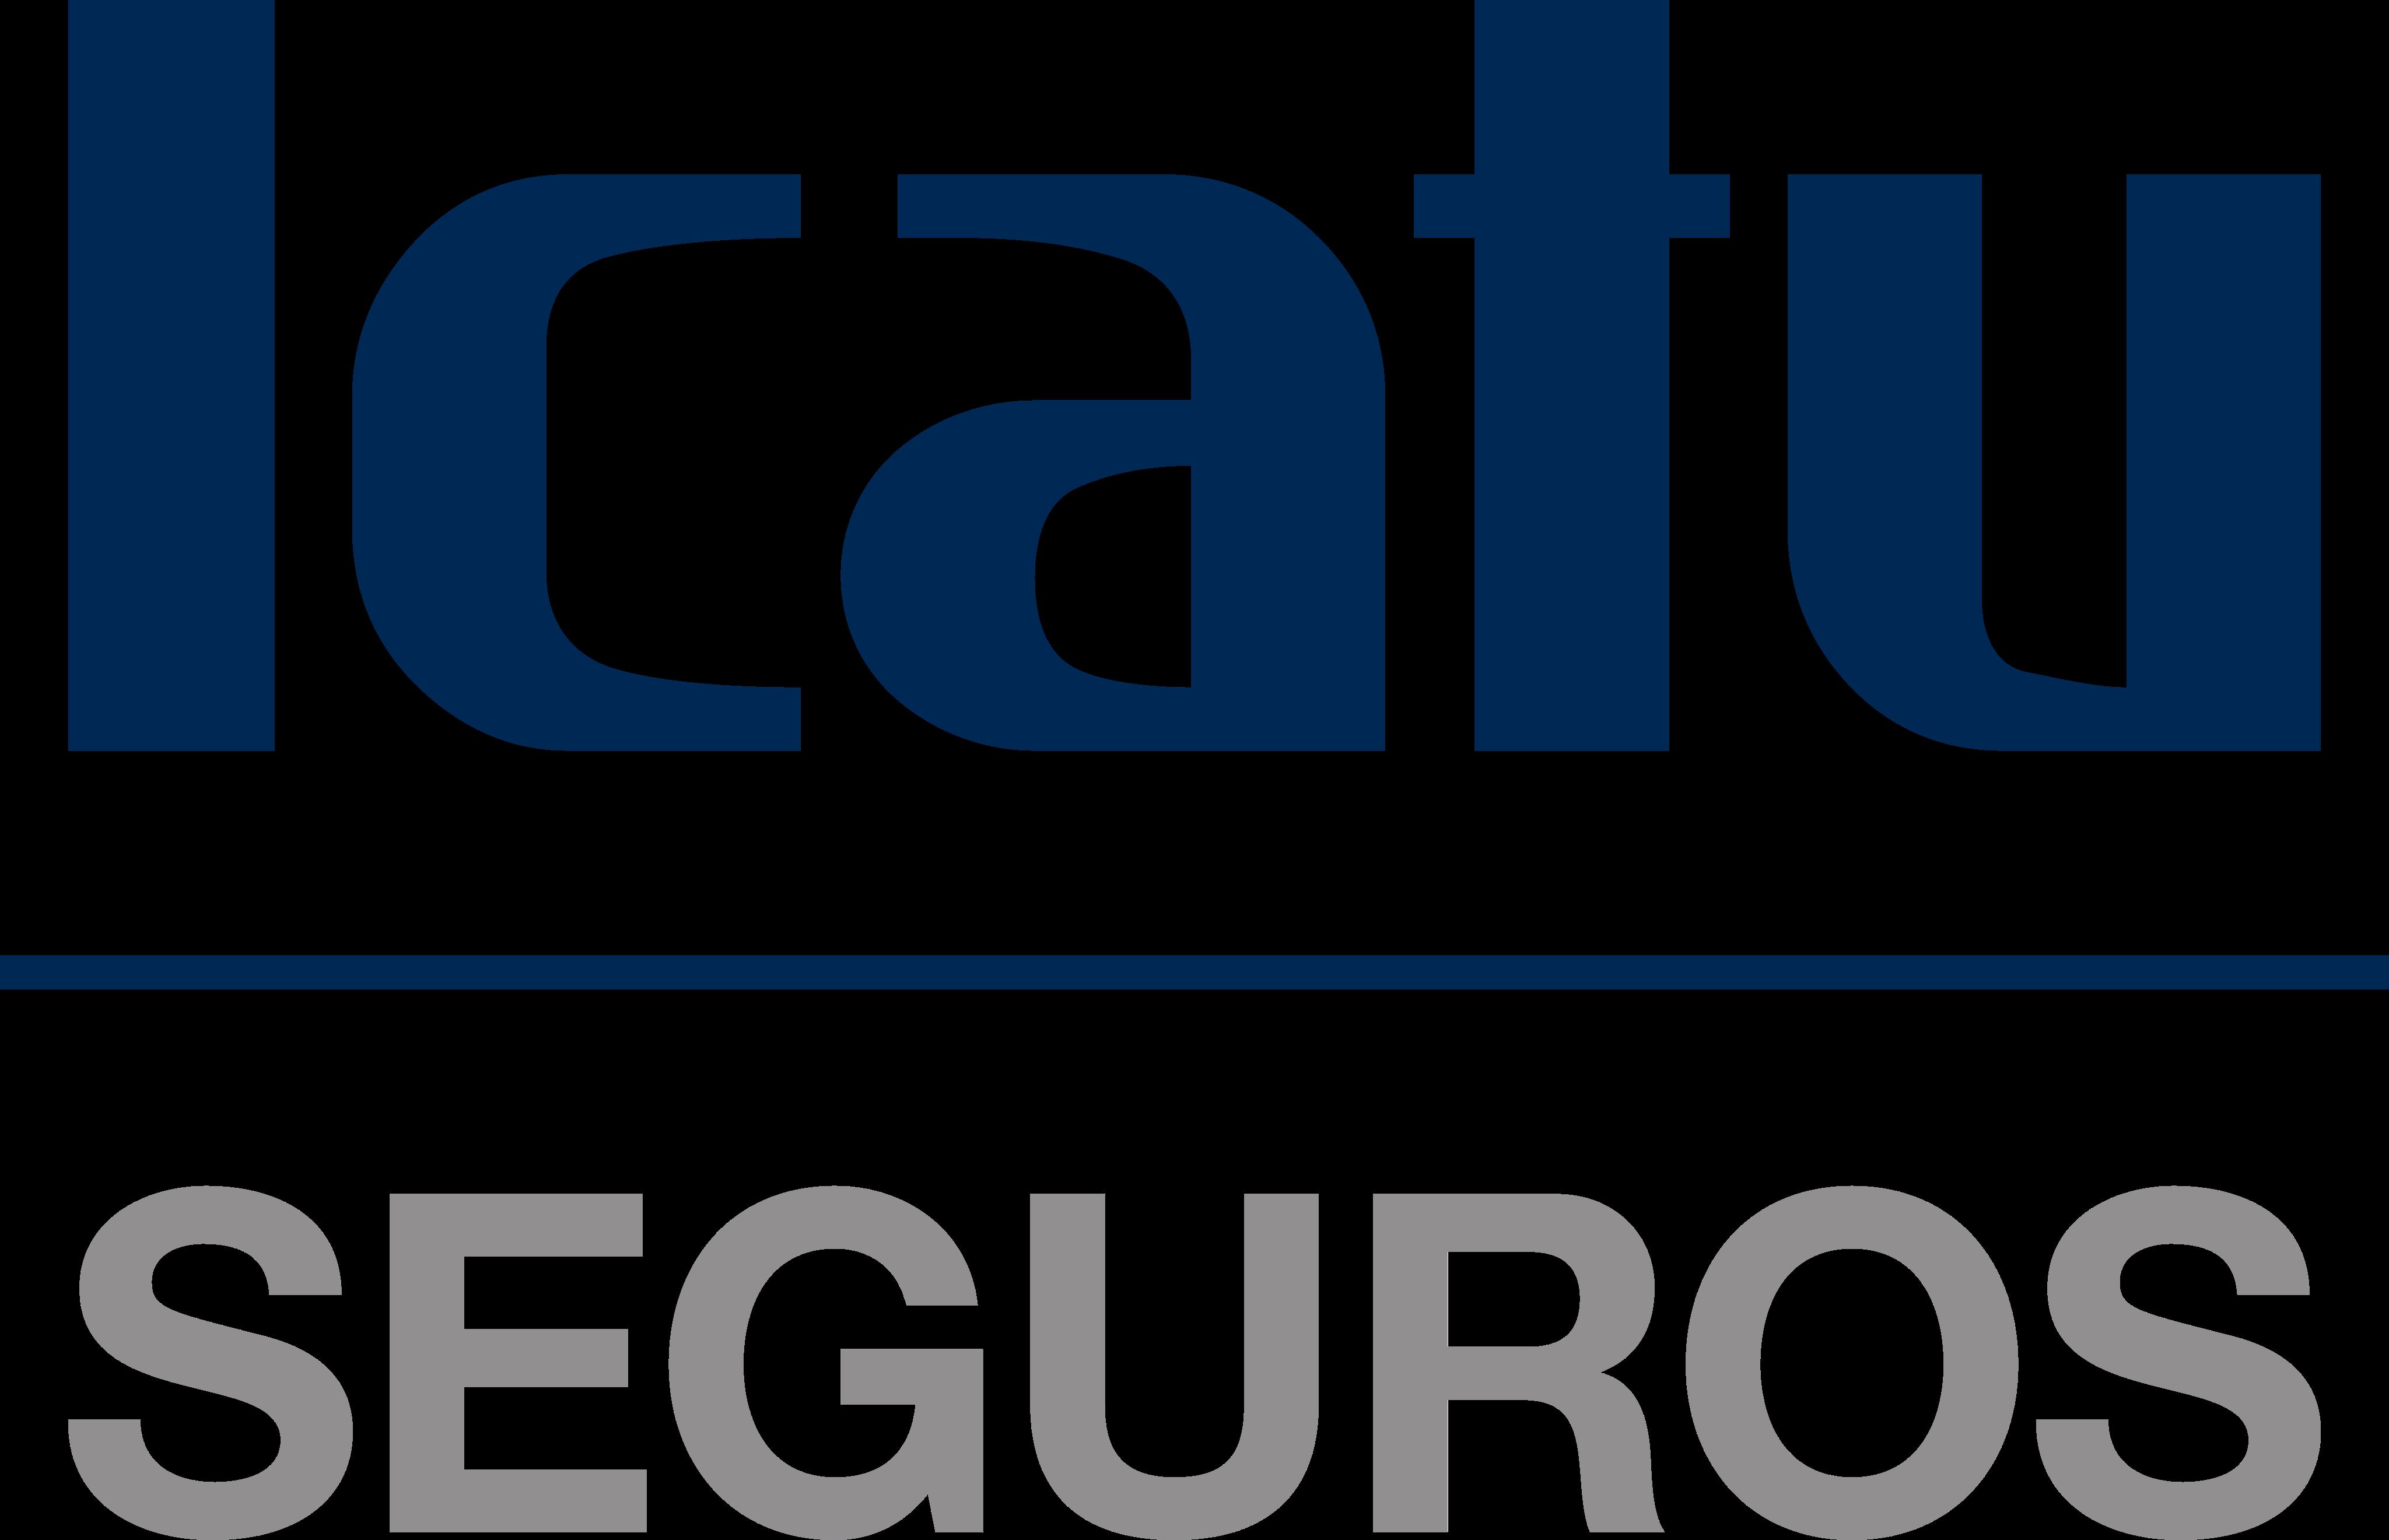 icatu-logo-1